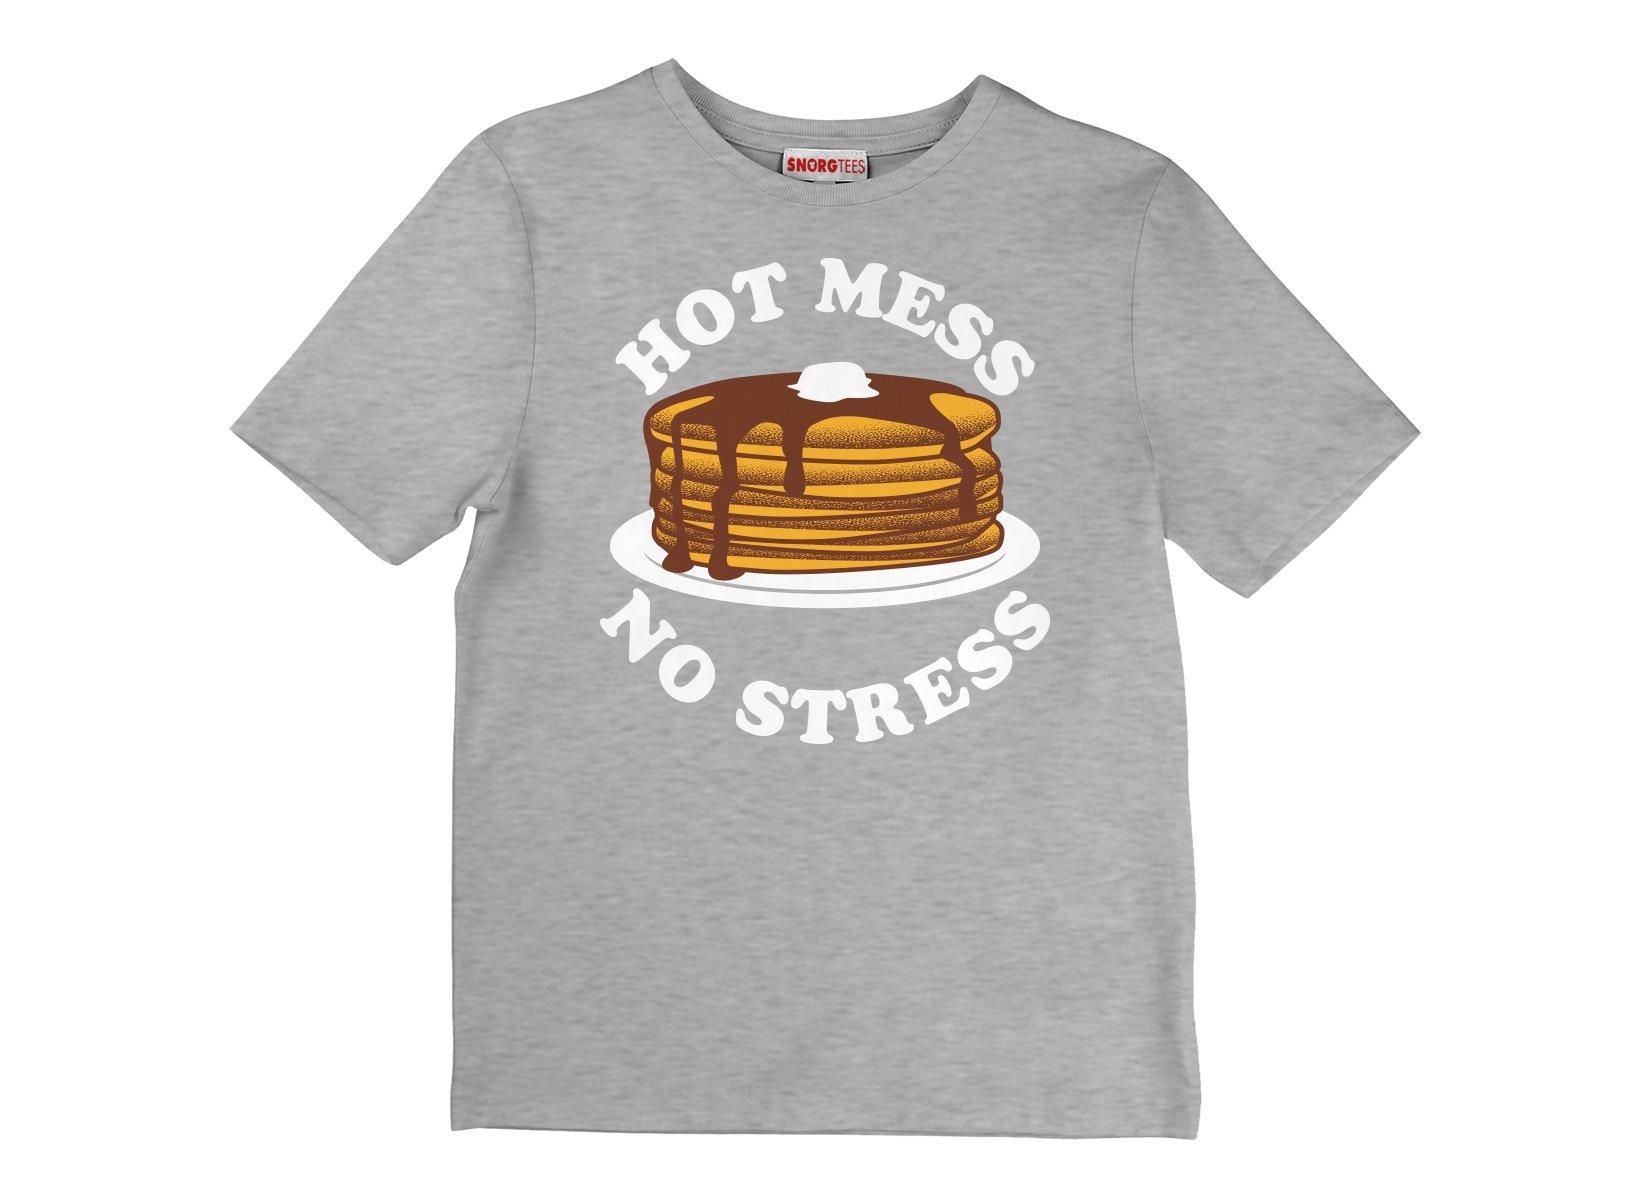 Hot Mess No Stress on Kids T-Shirt